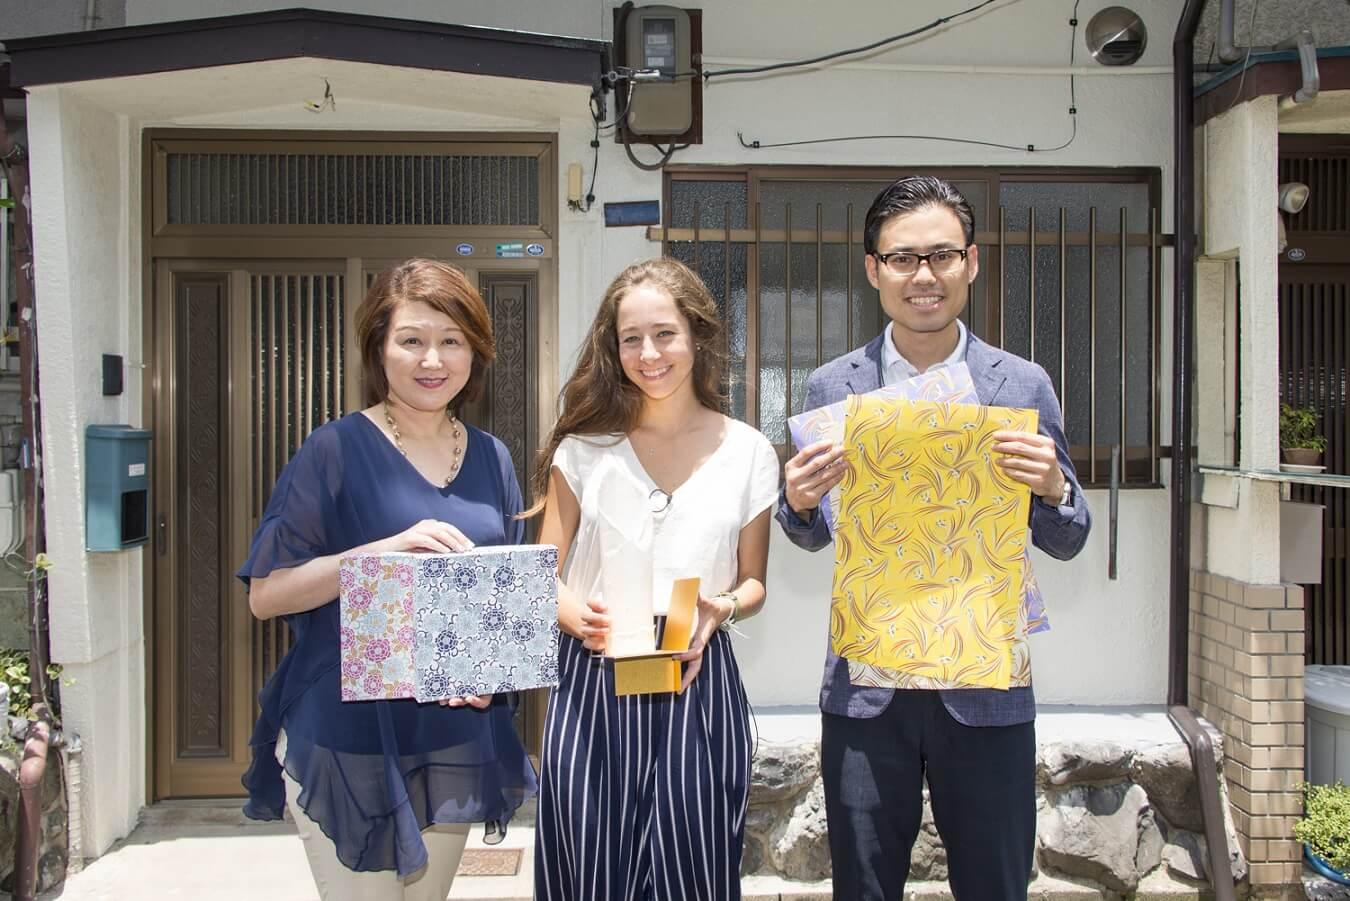 Sejarah Dan Perkembangan Kertas Washi Dalam Kehidupan Jepang